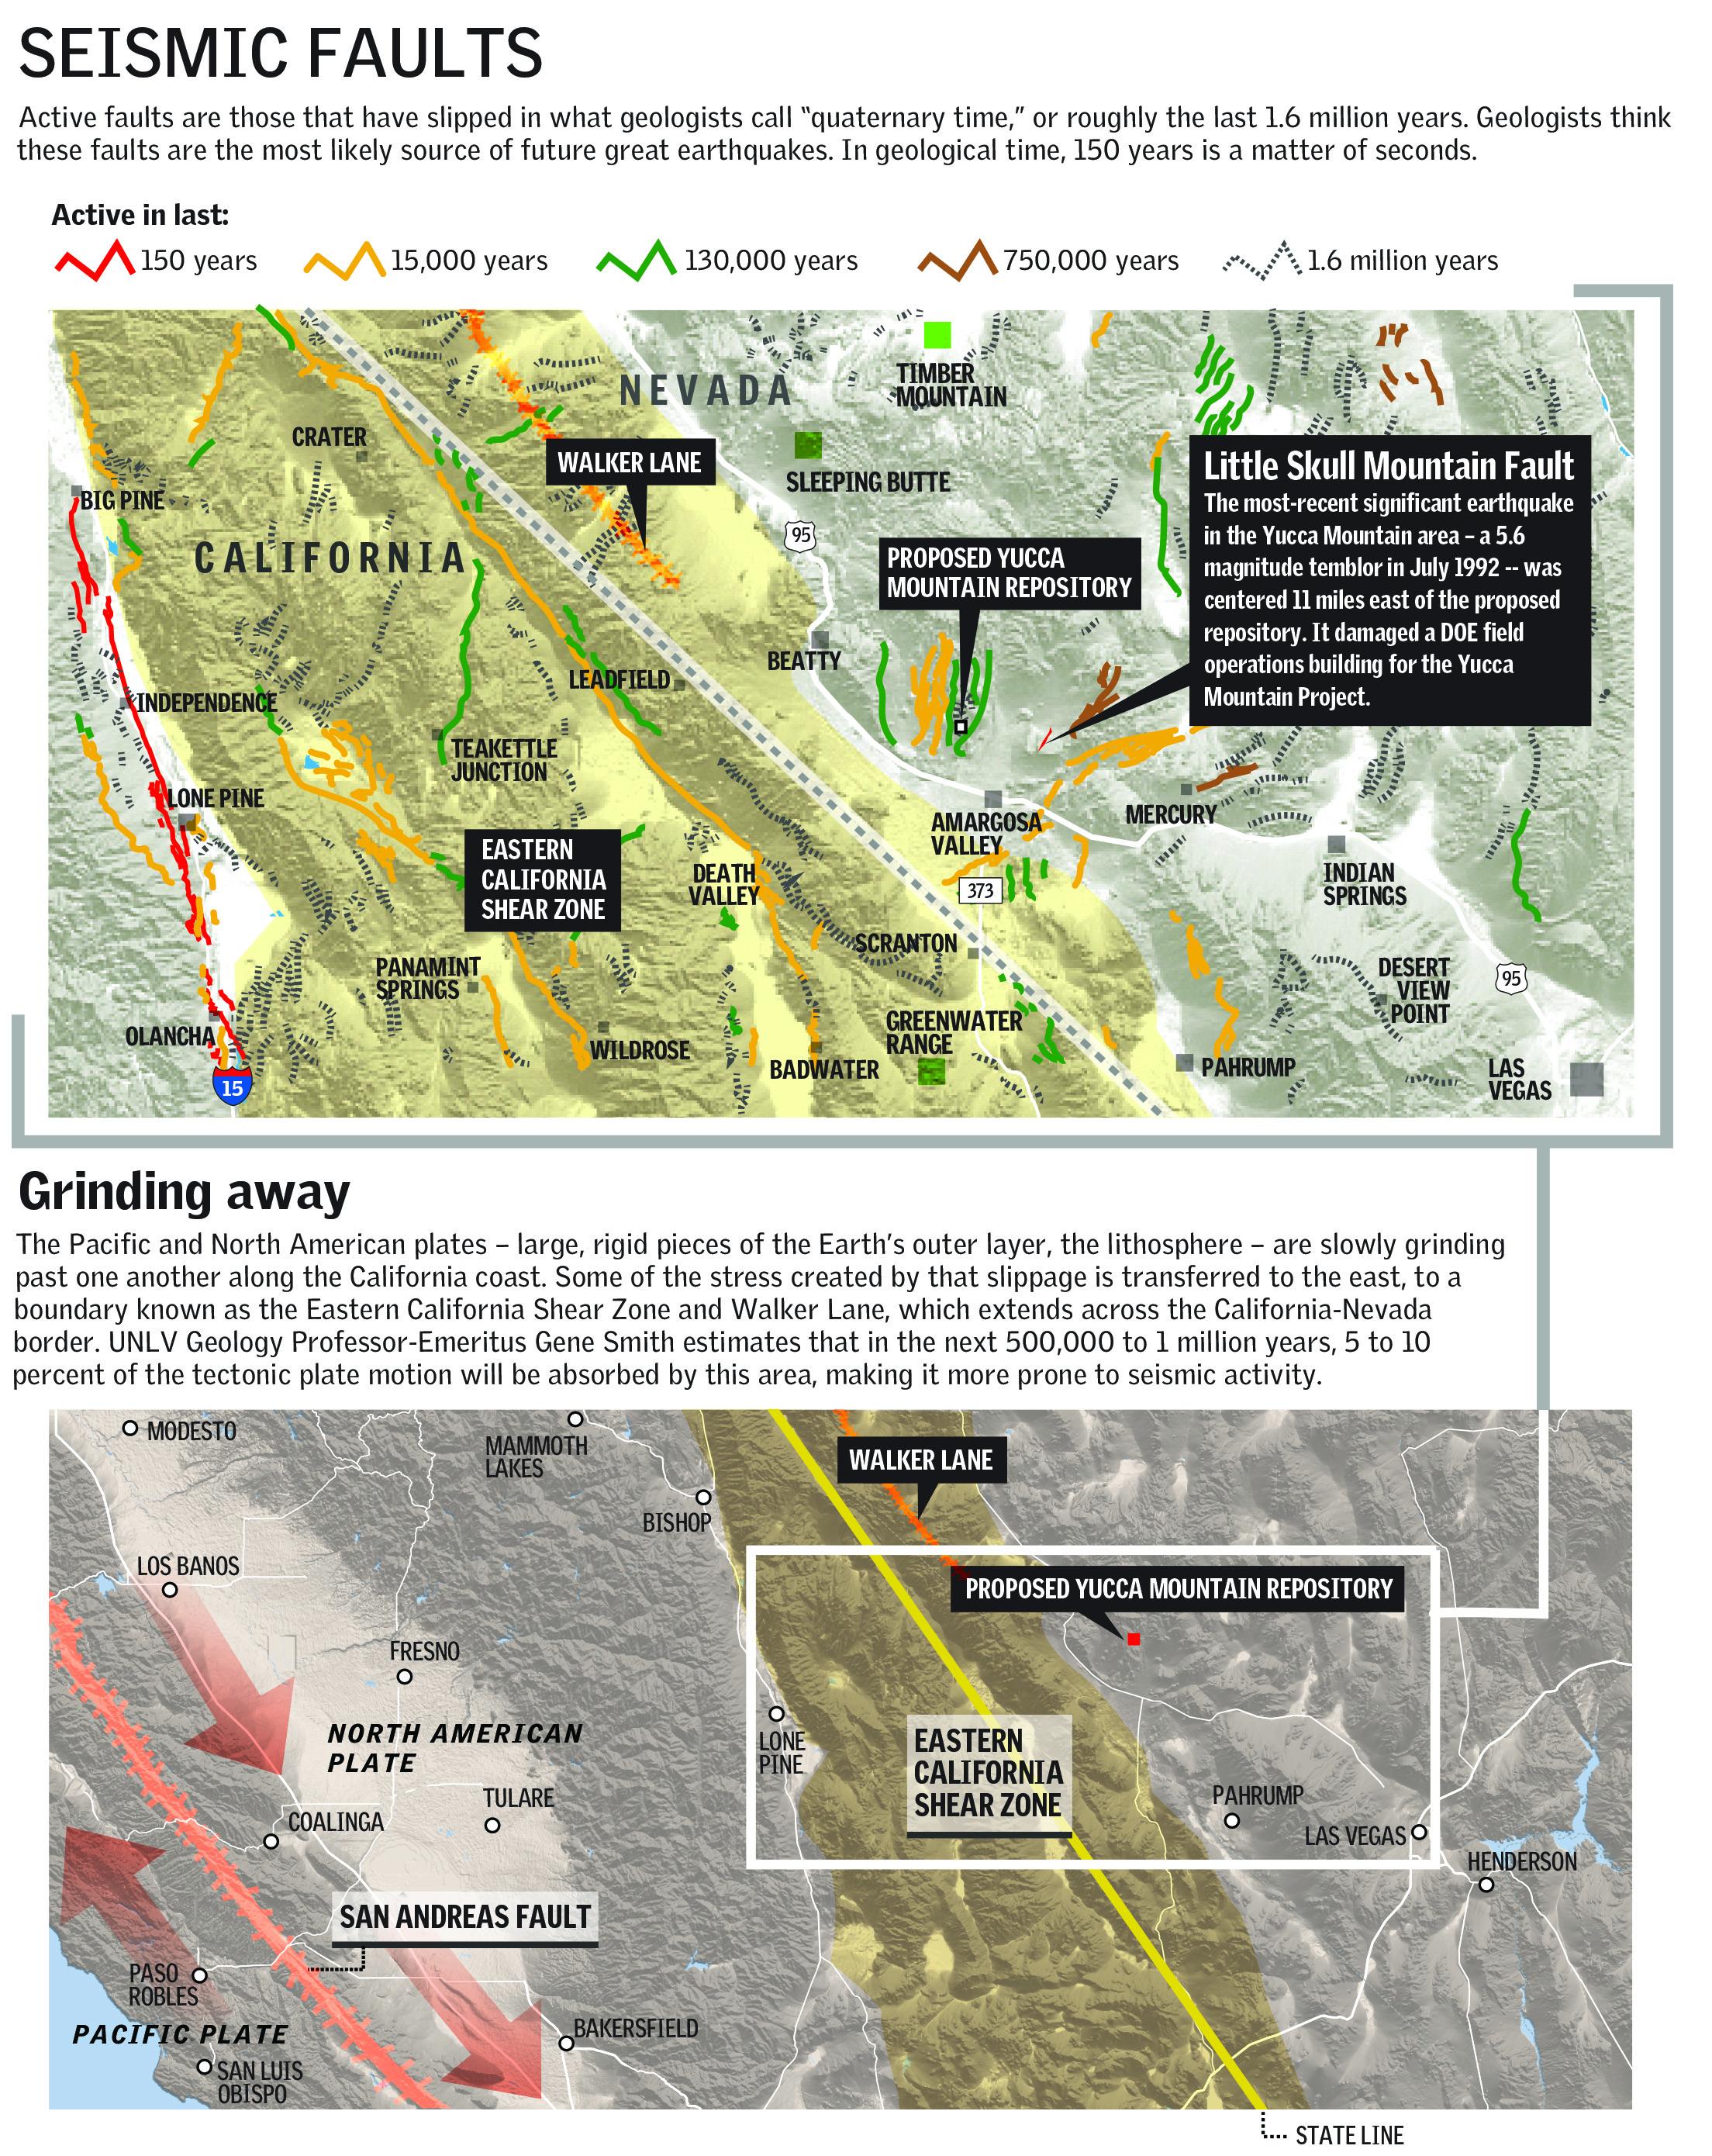 Seismic Faults